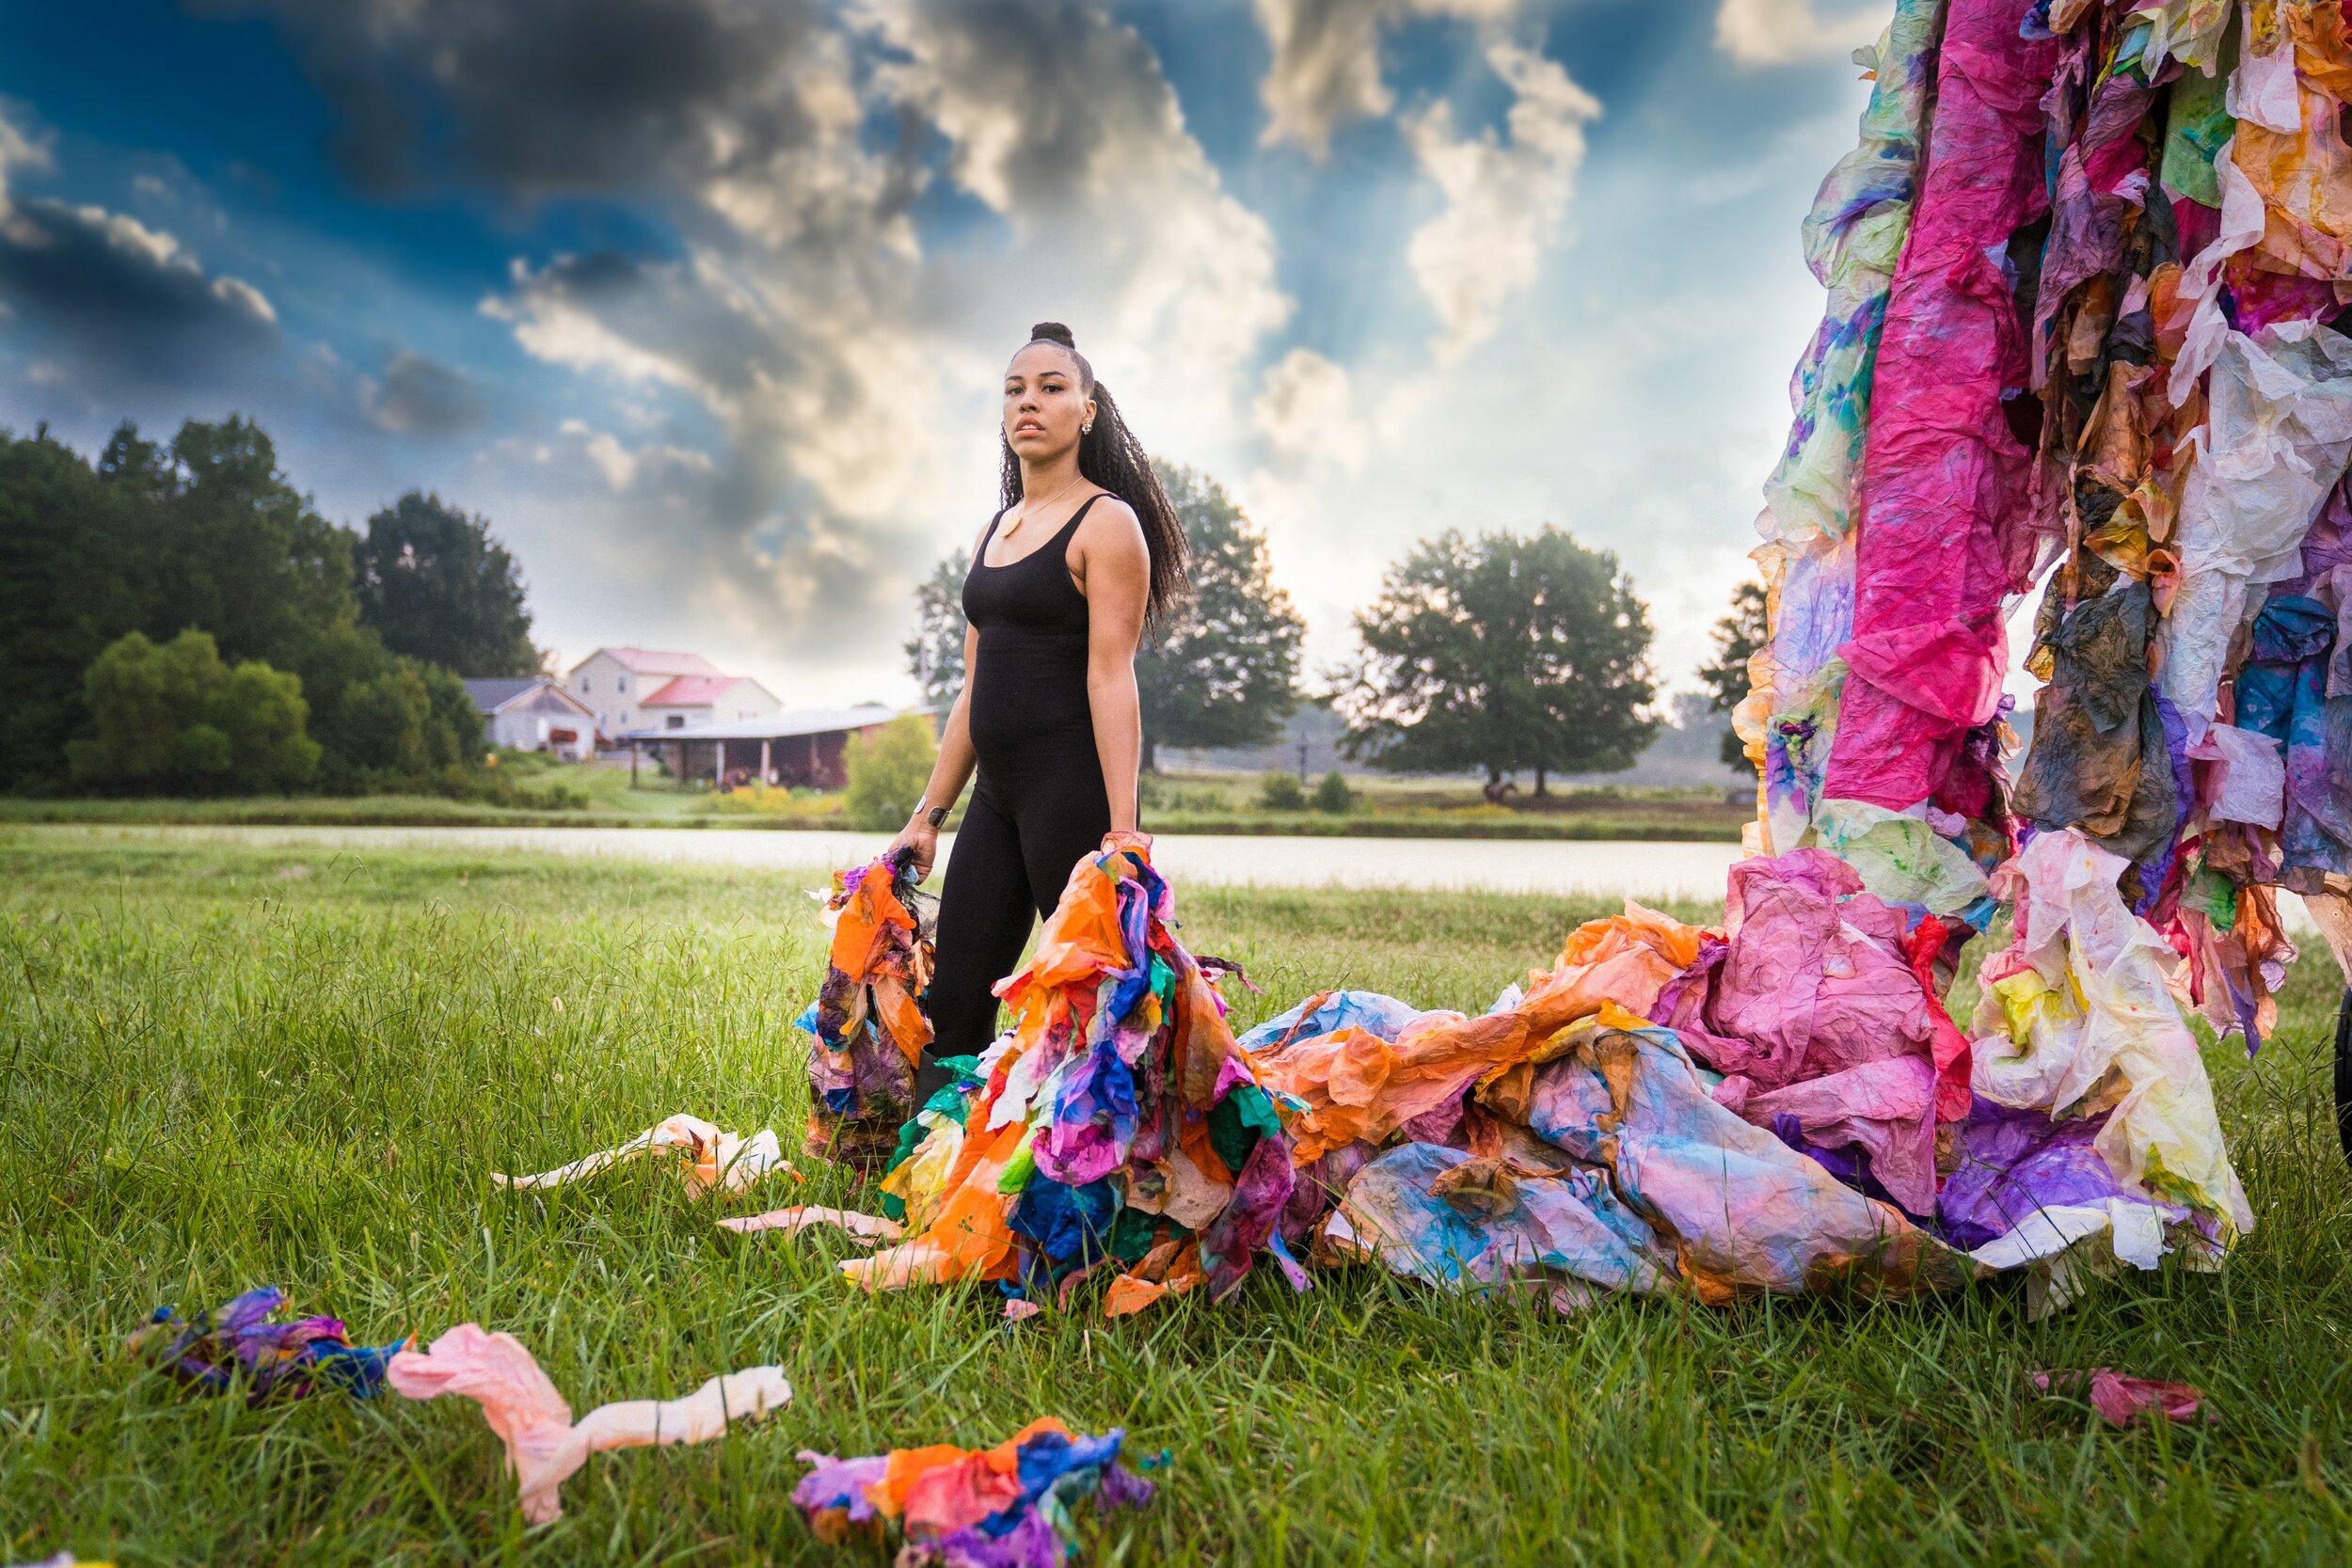 Oct/Nov 2019  Garden & Gun Magazine , Maya Freelon featured in  Book of Southern Women